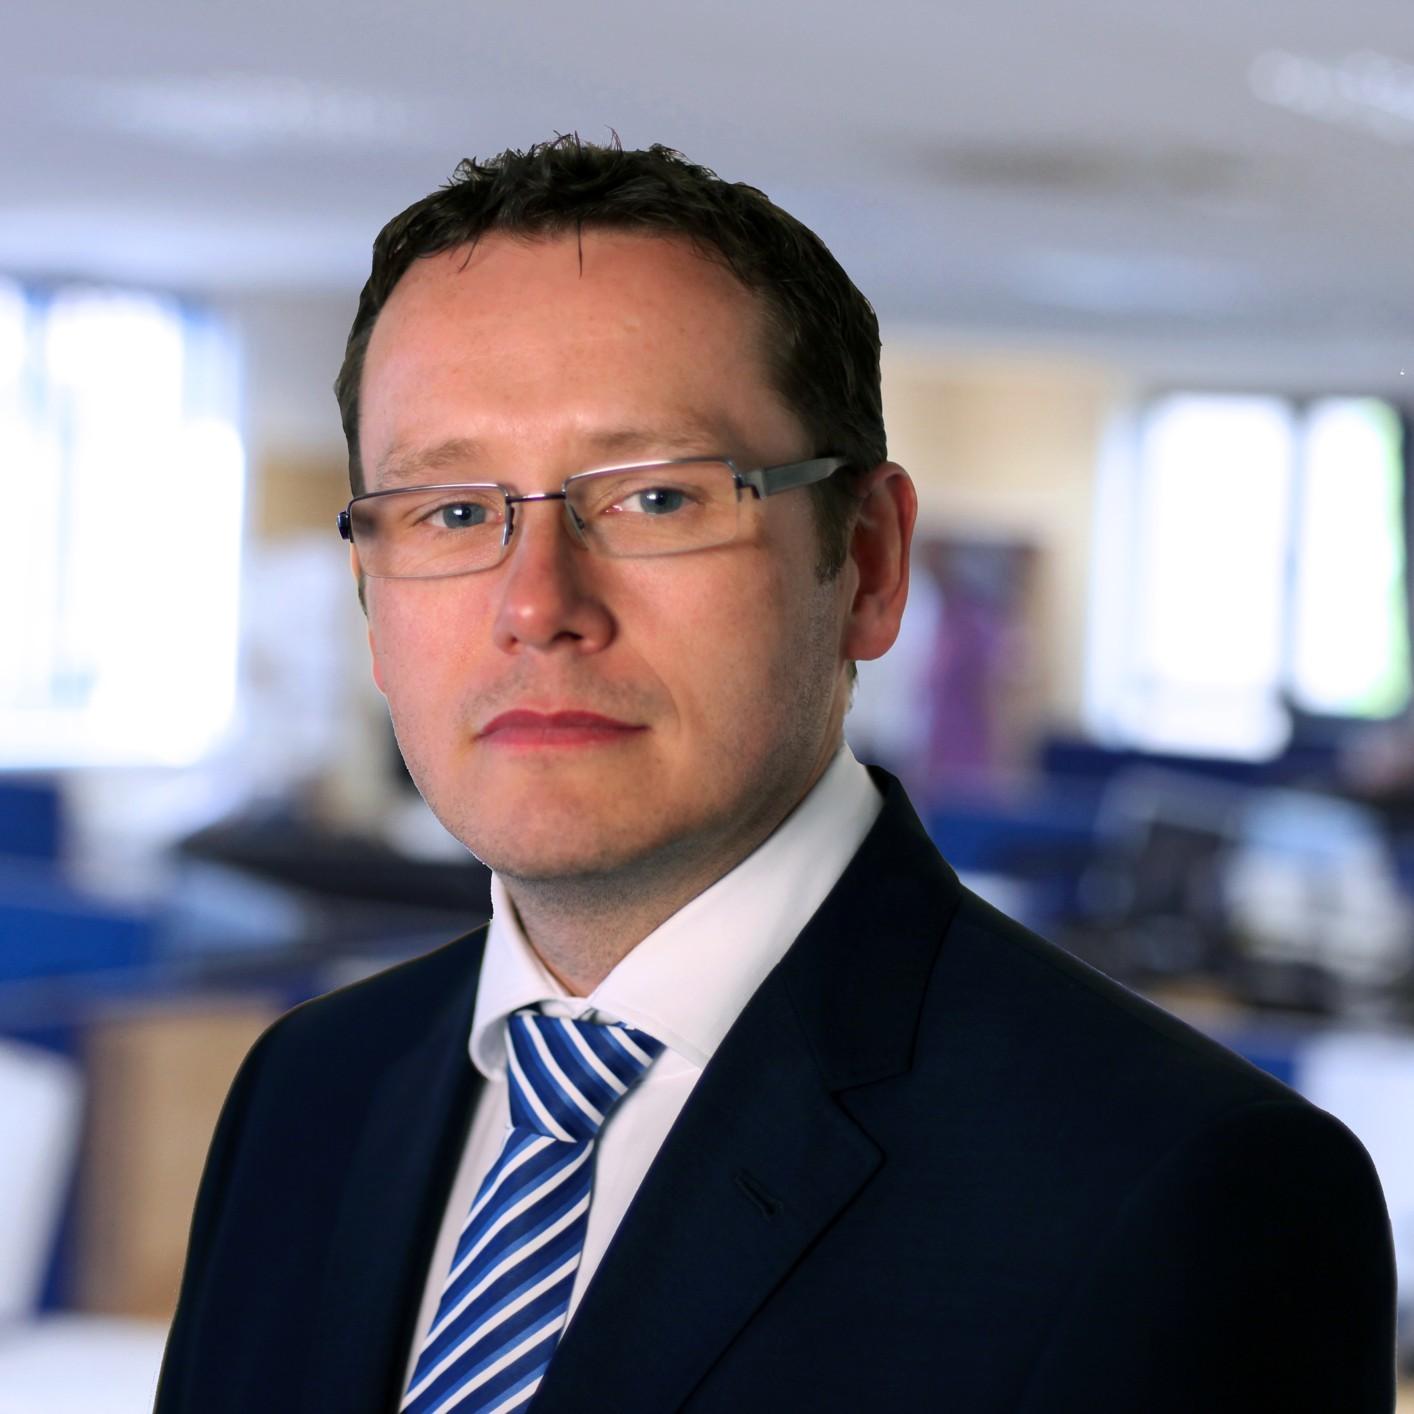 George Morrison, managing director of Aquaterra Energy